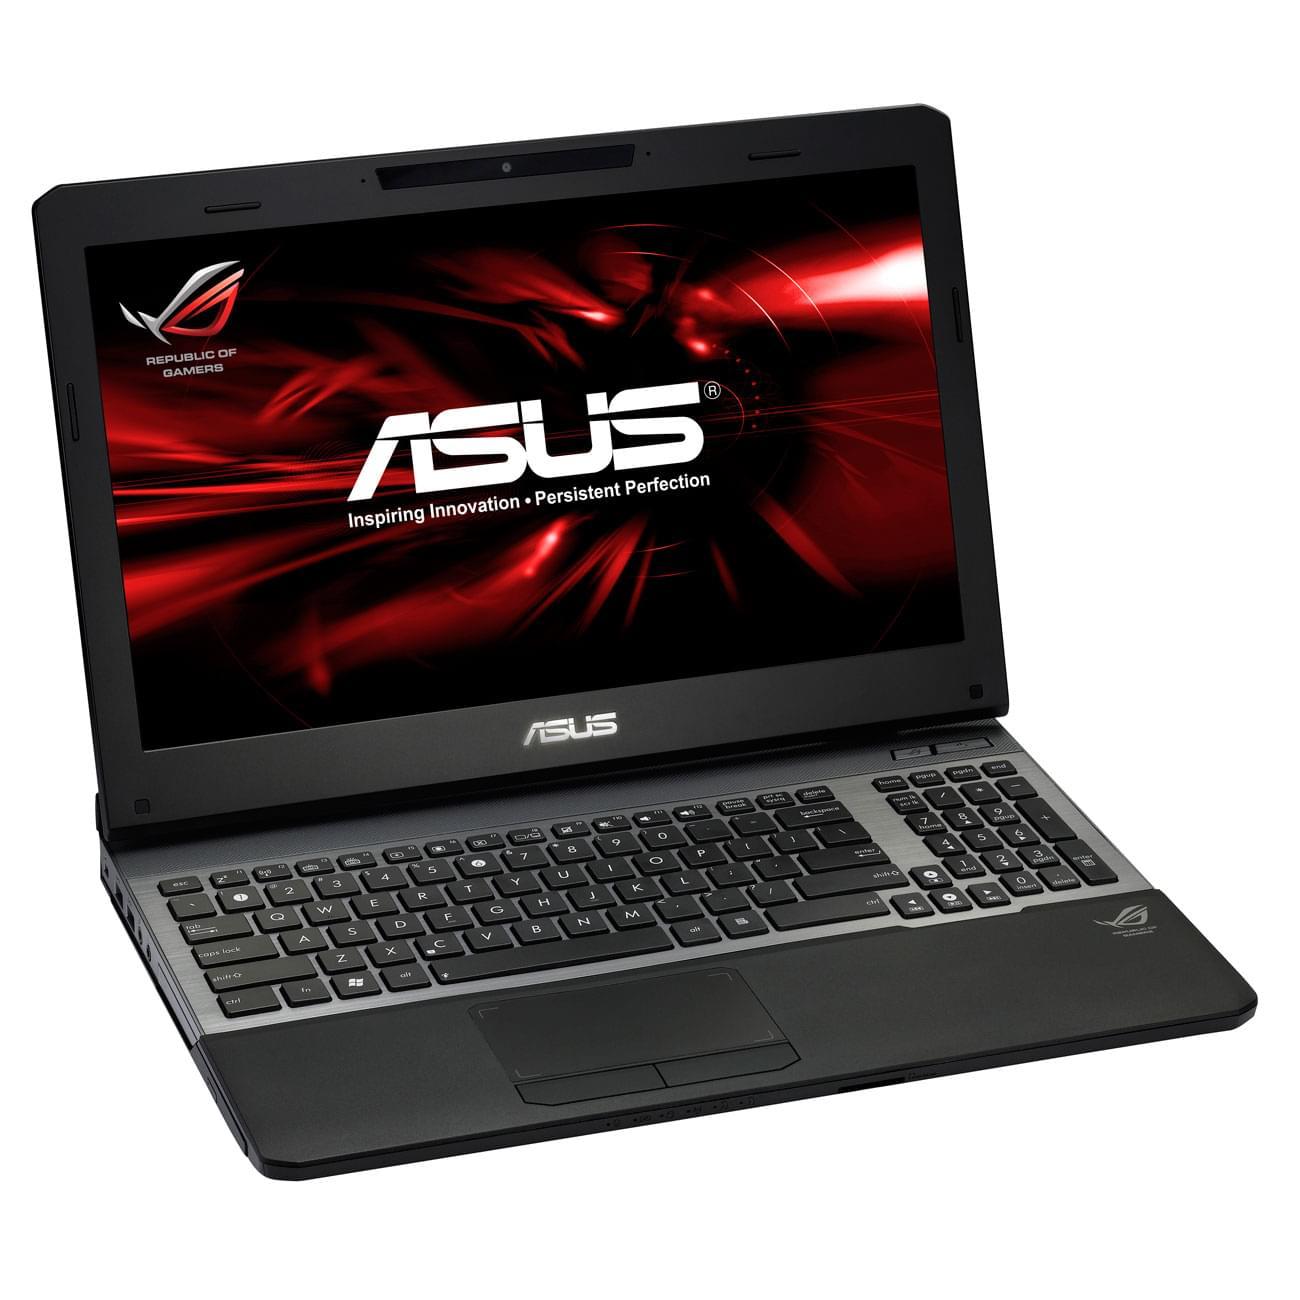 Asus G55VW-S1129V (G55VW-S1129V) - Achat / Vente PC Portable sur Cybertek.fr - 0